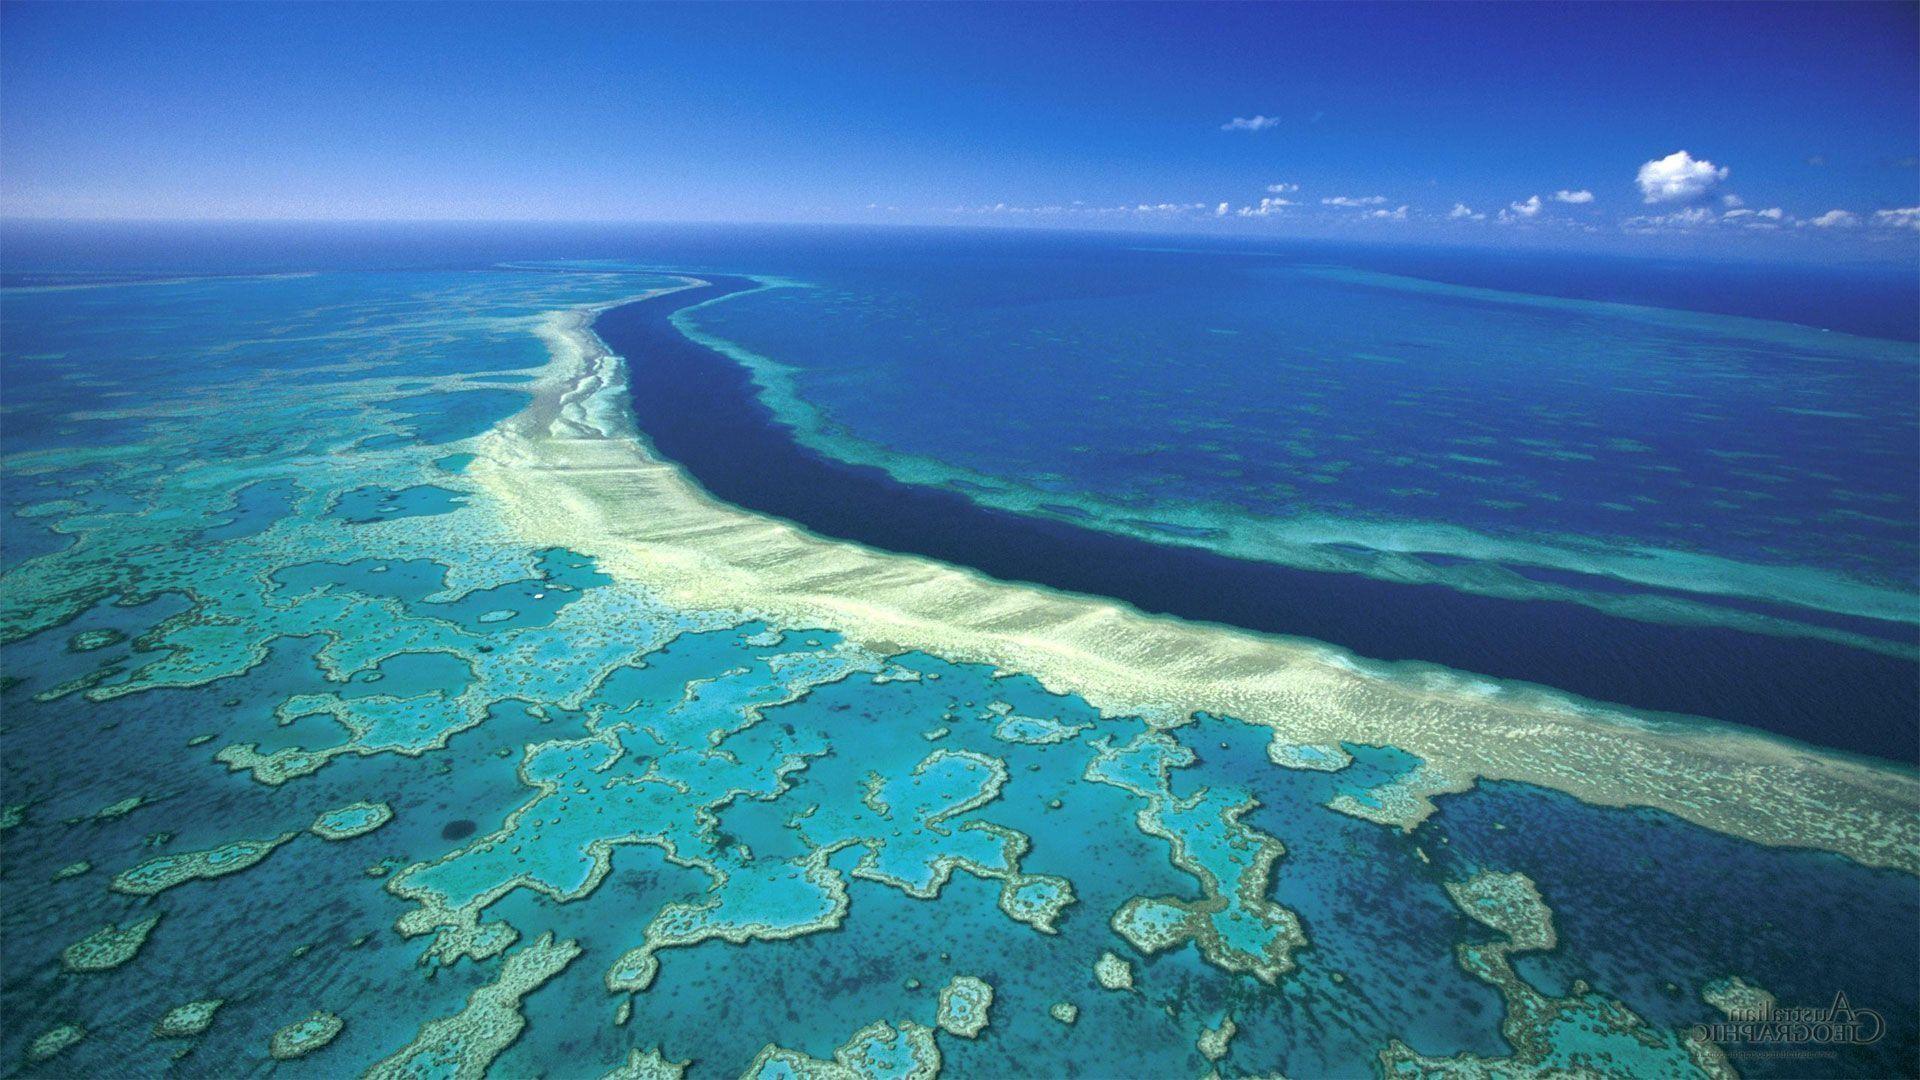 Apple Clownfish Wallpaper Iphone X Great Barrier Reef Wallpaper 61 Images